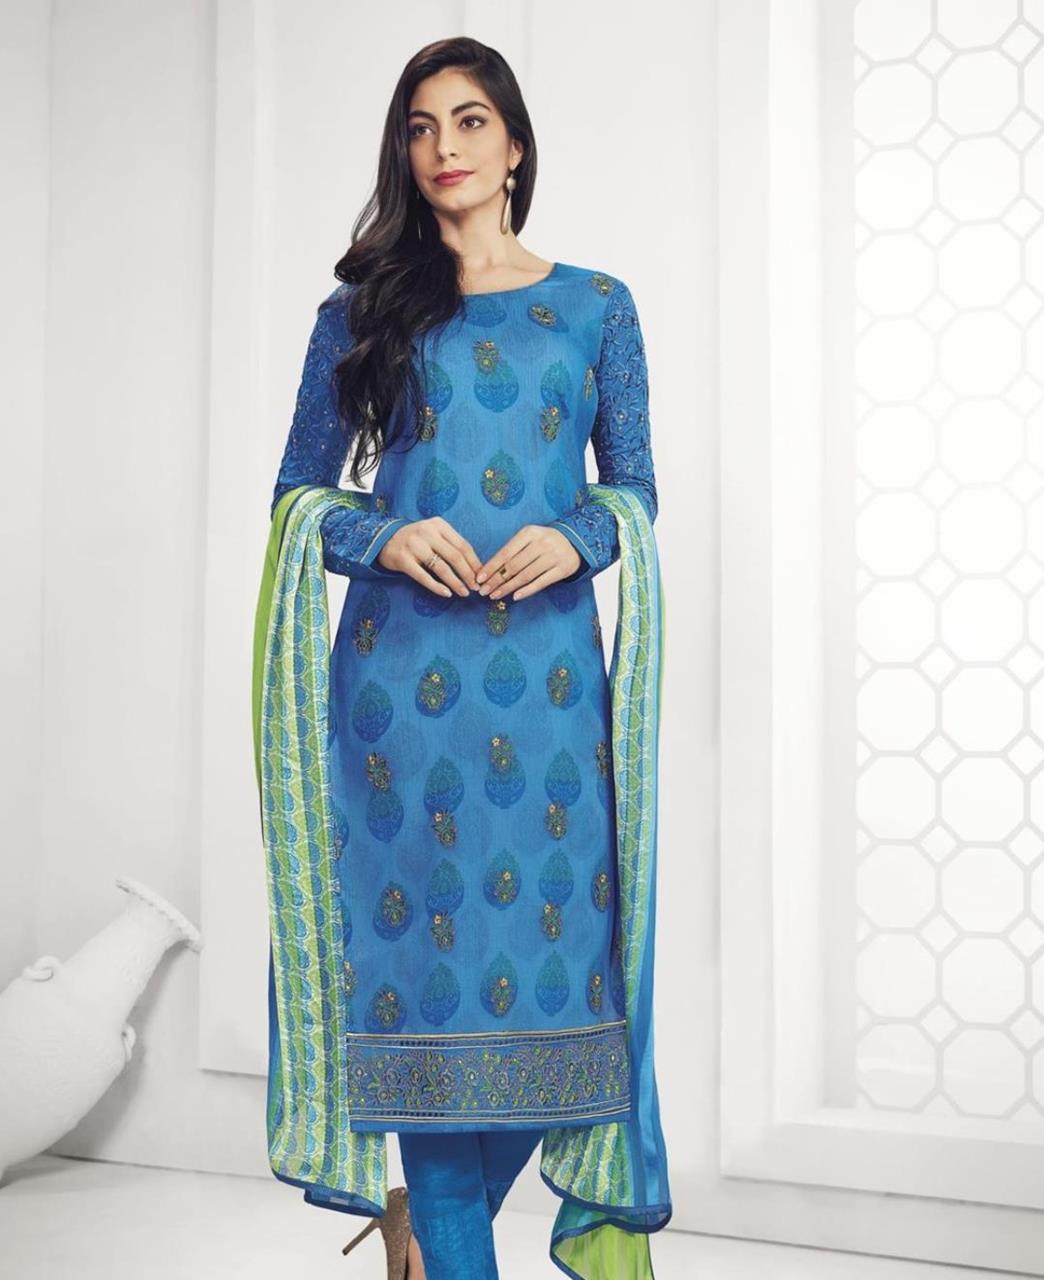 Stone Work Georgette Straight cut Salwar Kameez in Blue